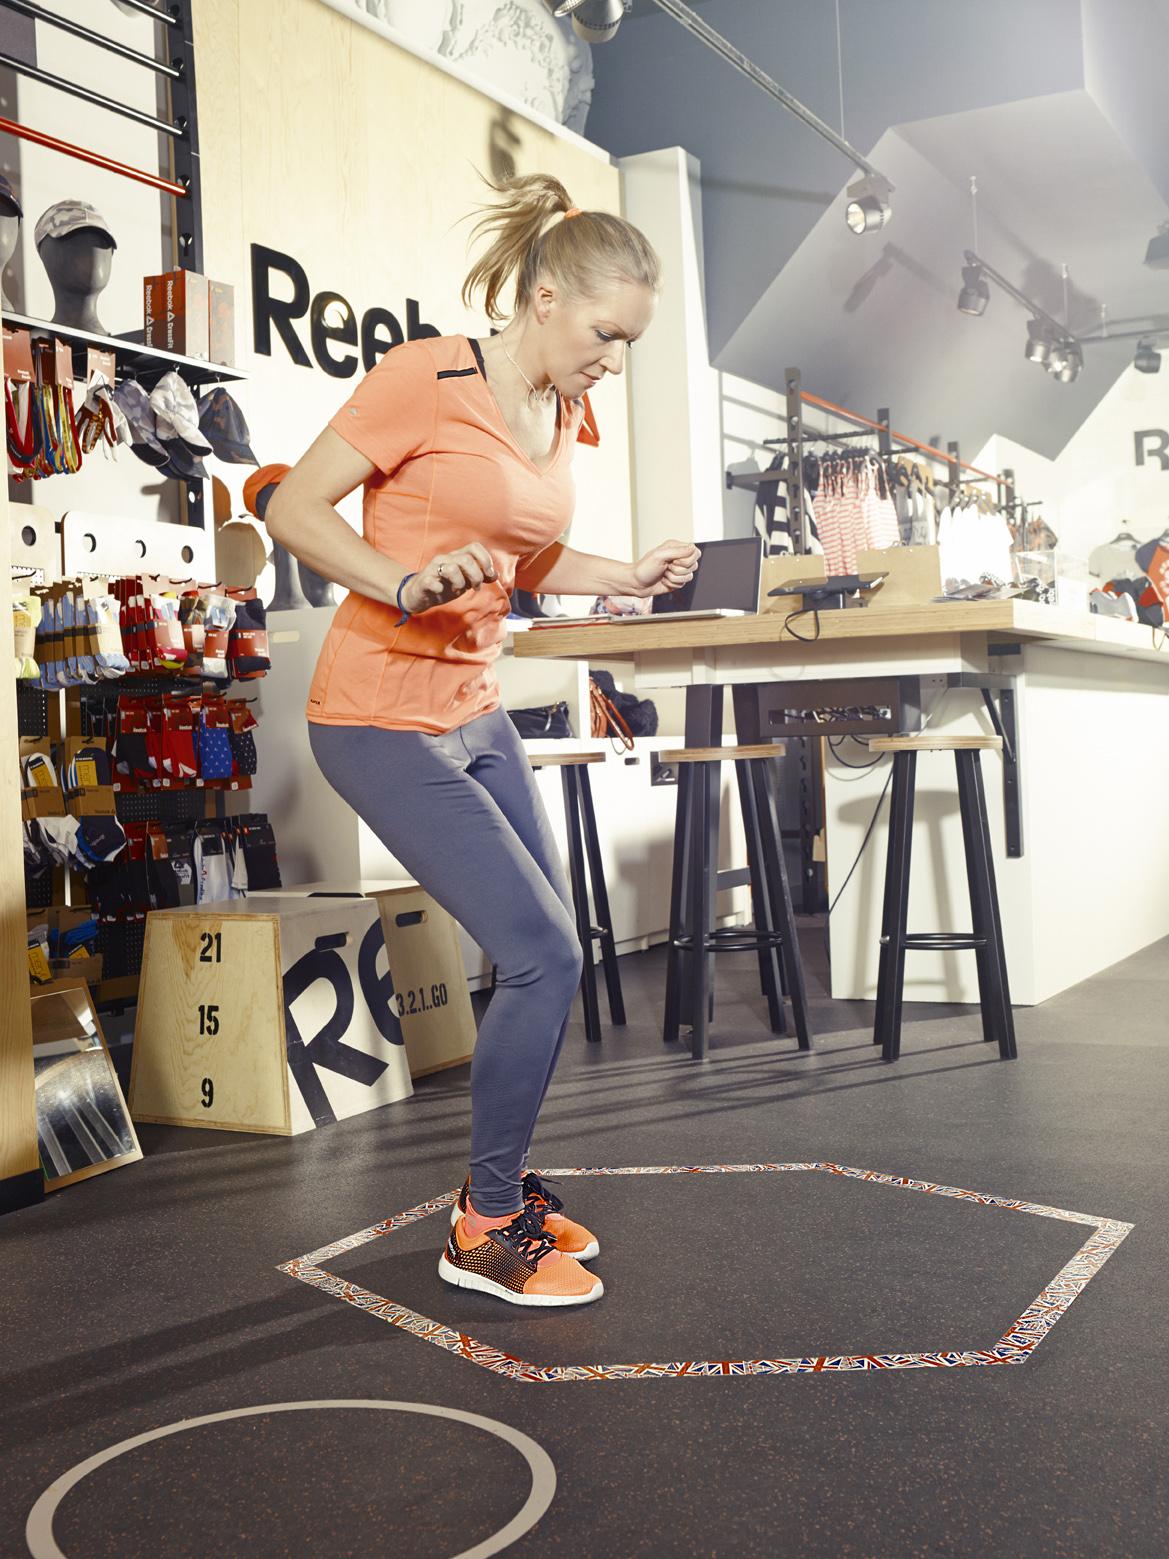 Reebok Fit Club, week one: The secrets of running fast